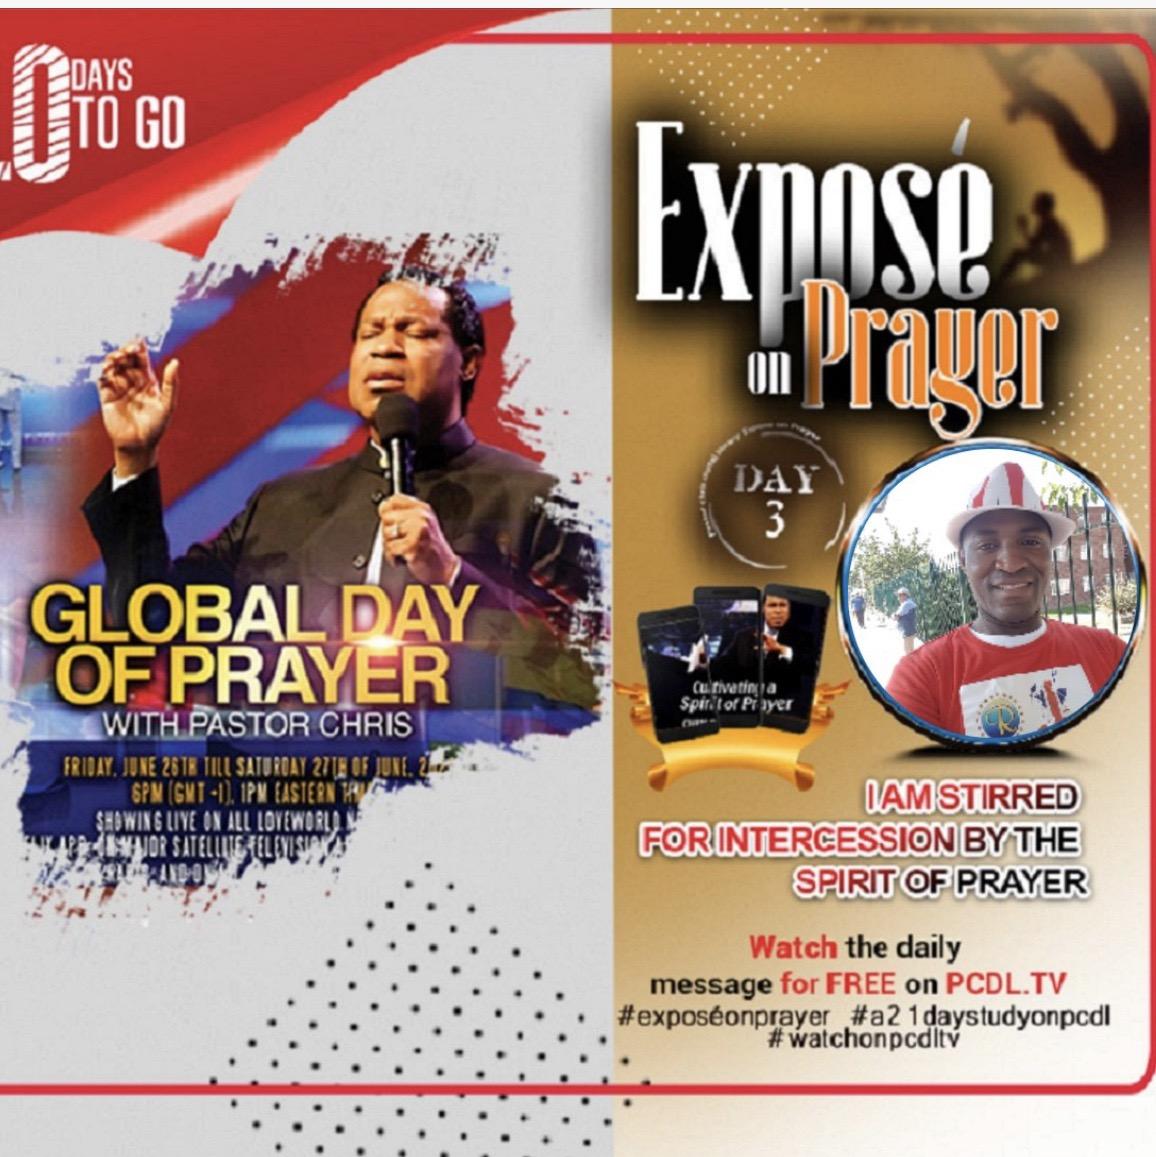 🙏*EXPOSÉ ON PRAYER DAY 3*